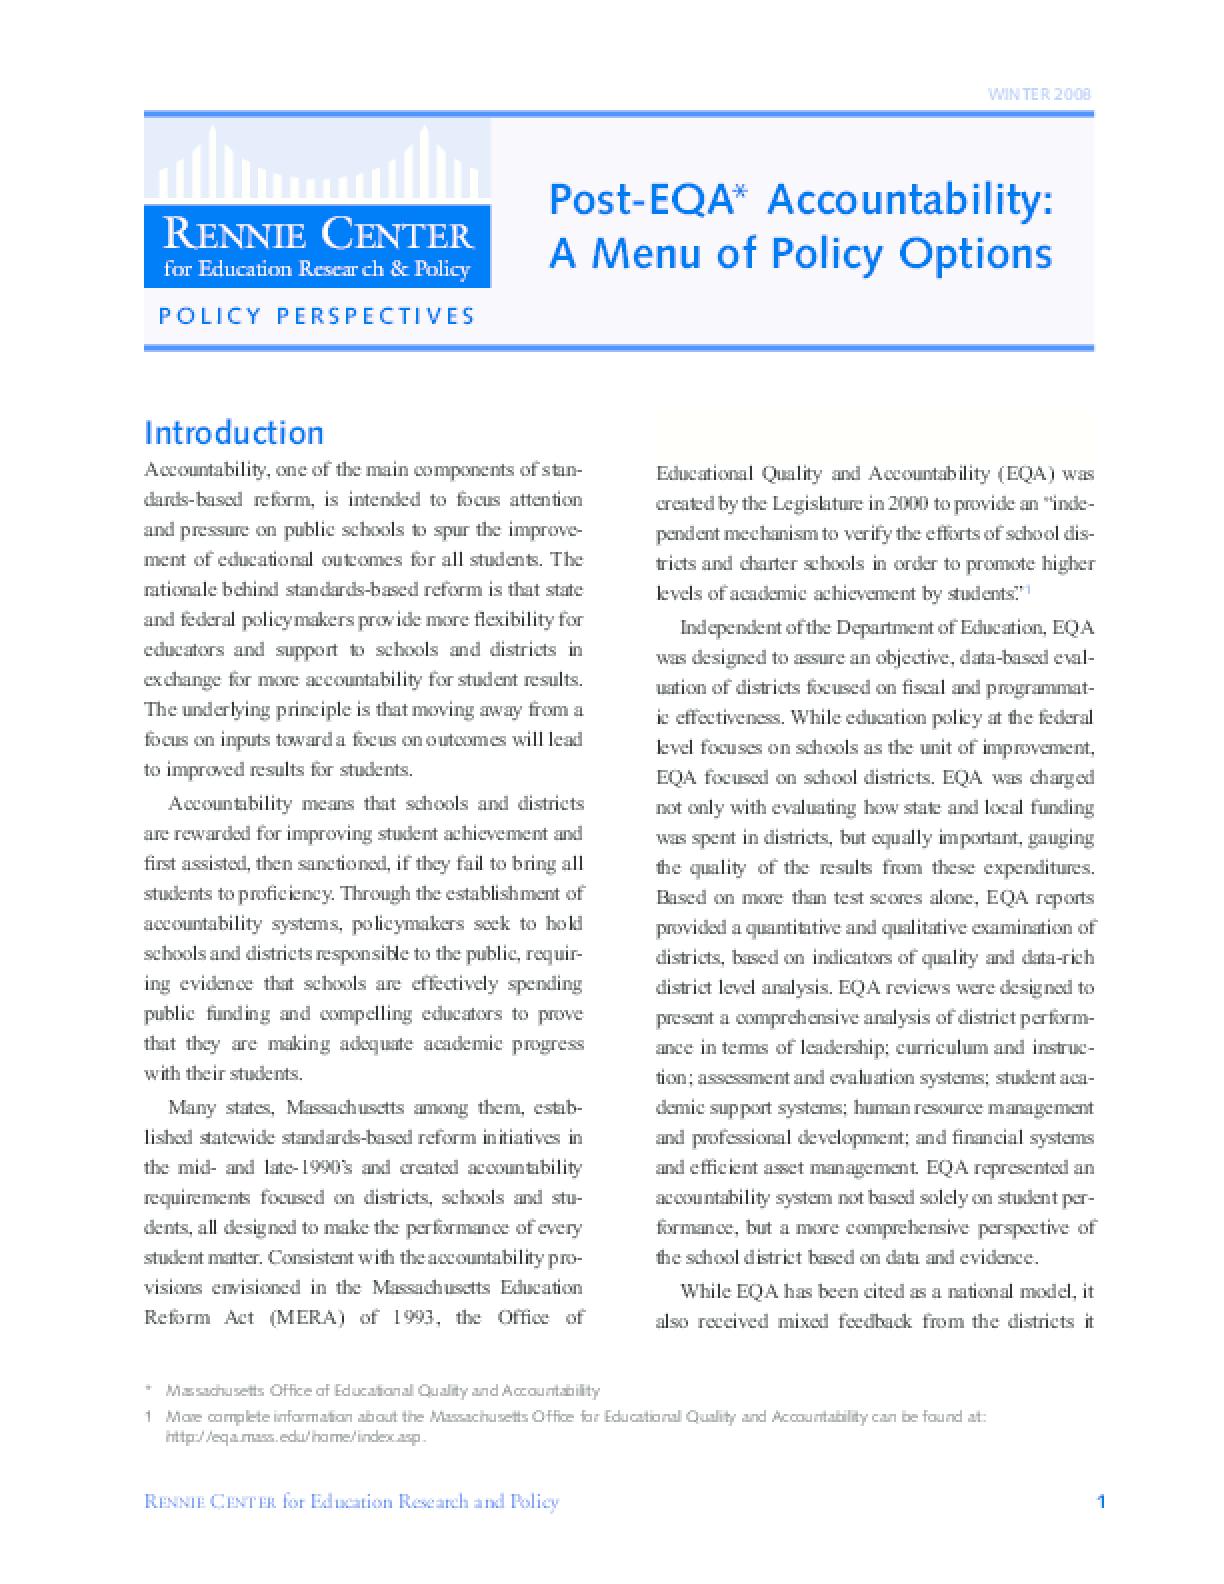 Post-EQA Accountability: A Menu of Policy Options